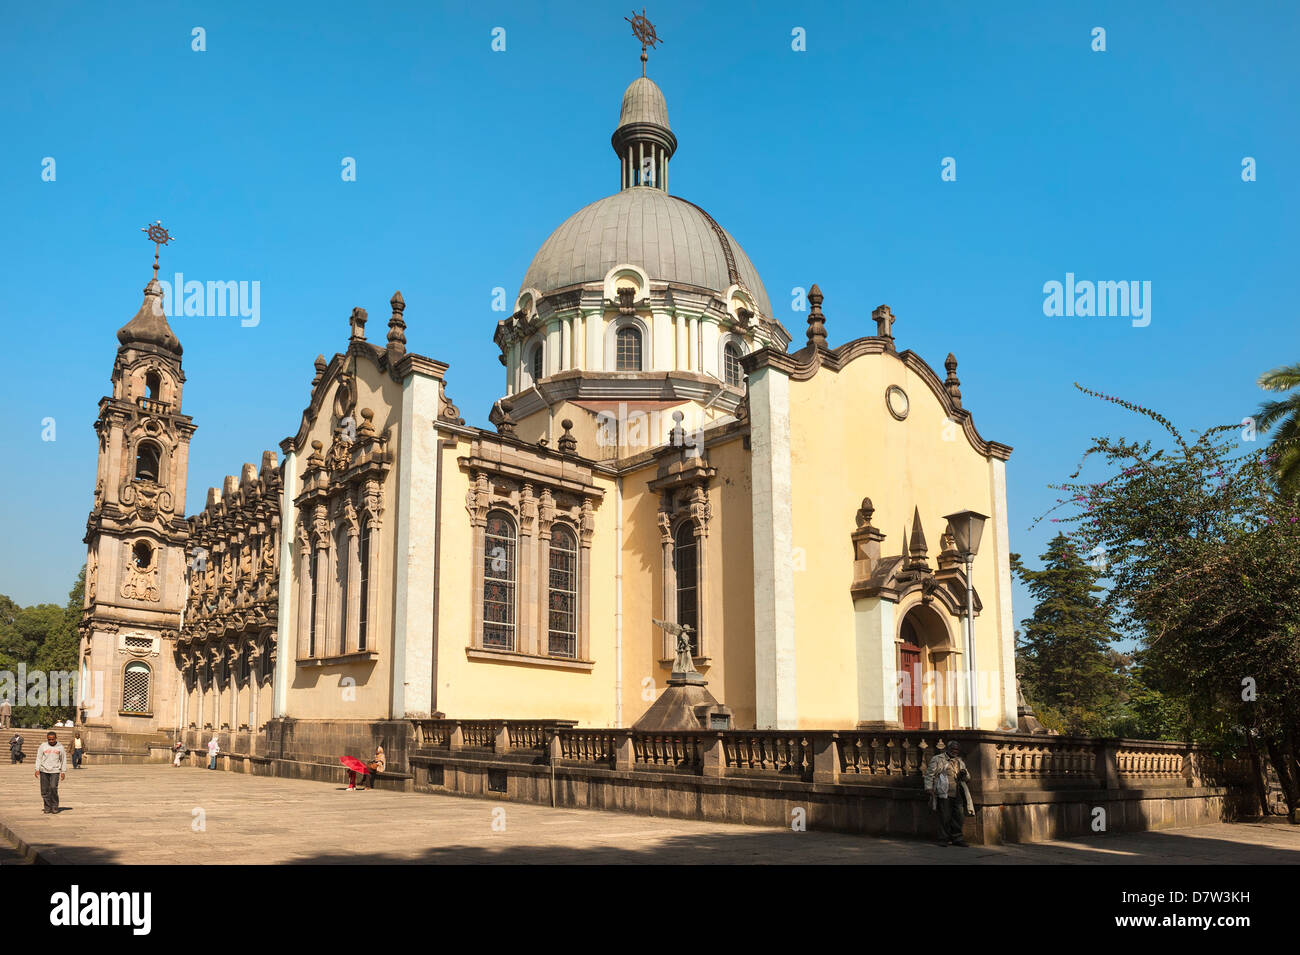 Holy Trinity Cathedral, (Kiddist Selassie), Addis Ababa, Ethiopia - Stock Image